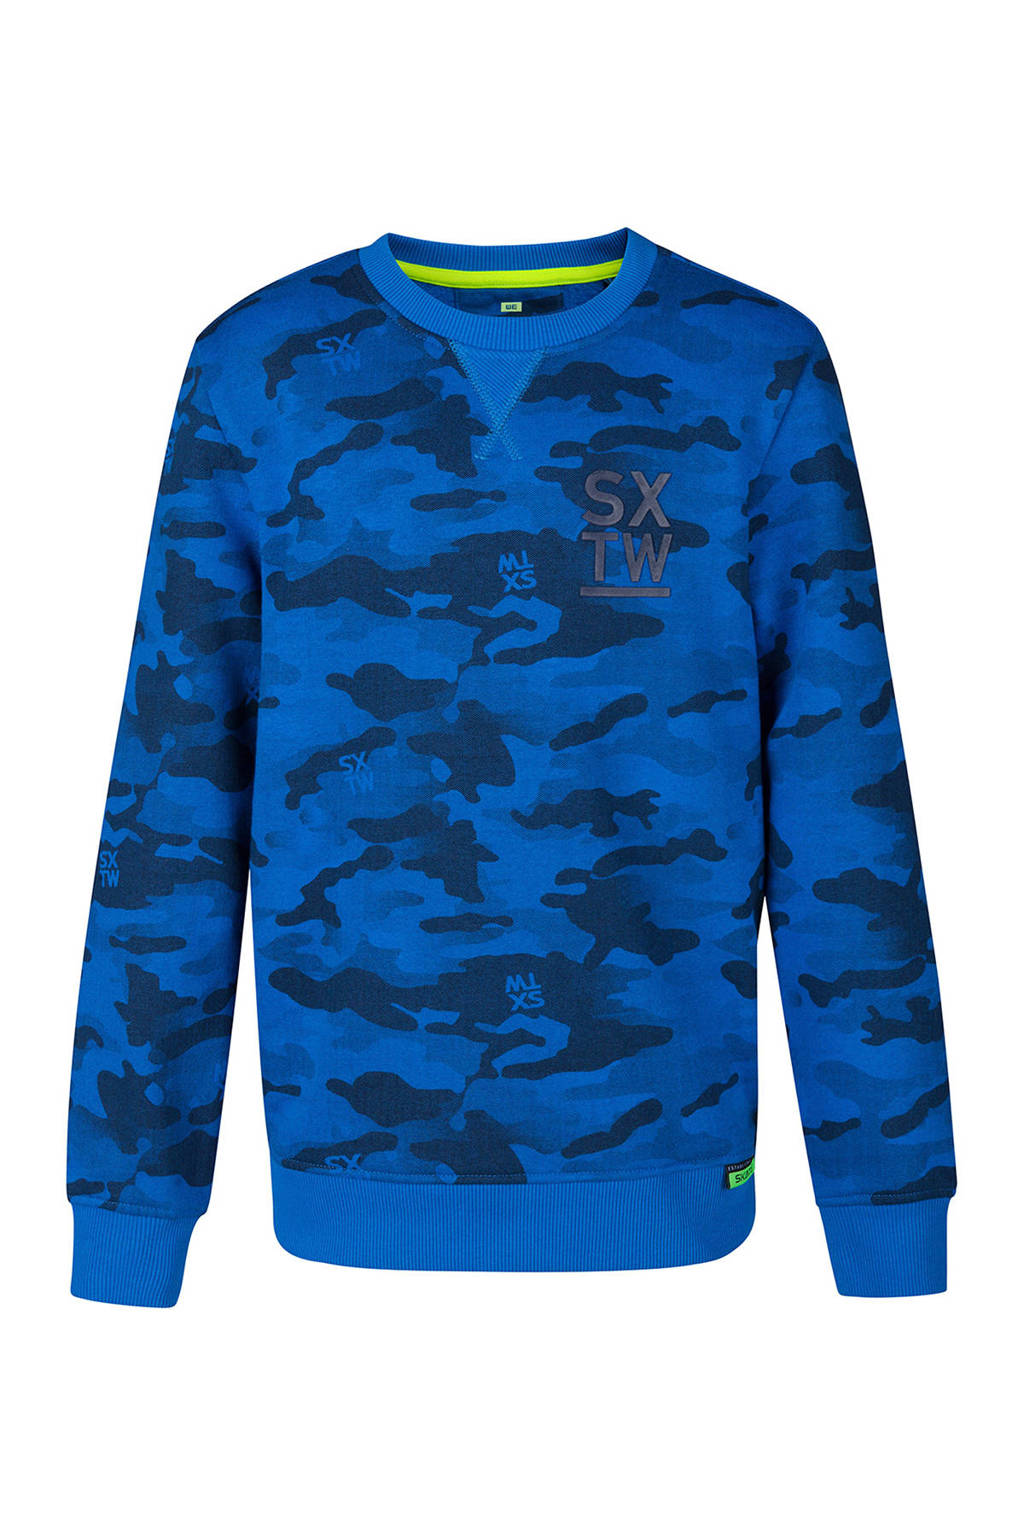 WE Fashion sweater met camouflageprint blauw, Blauw